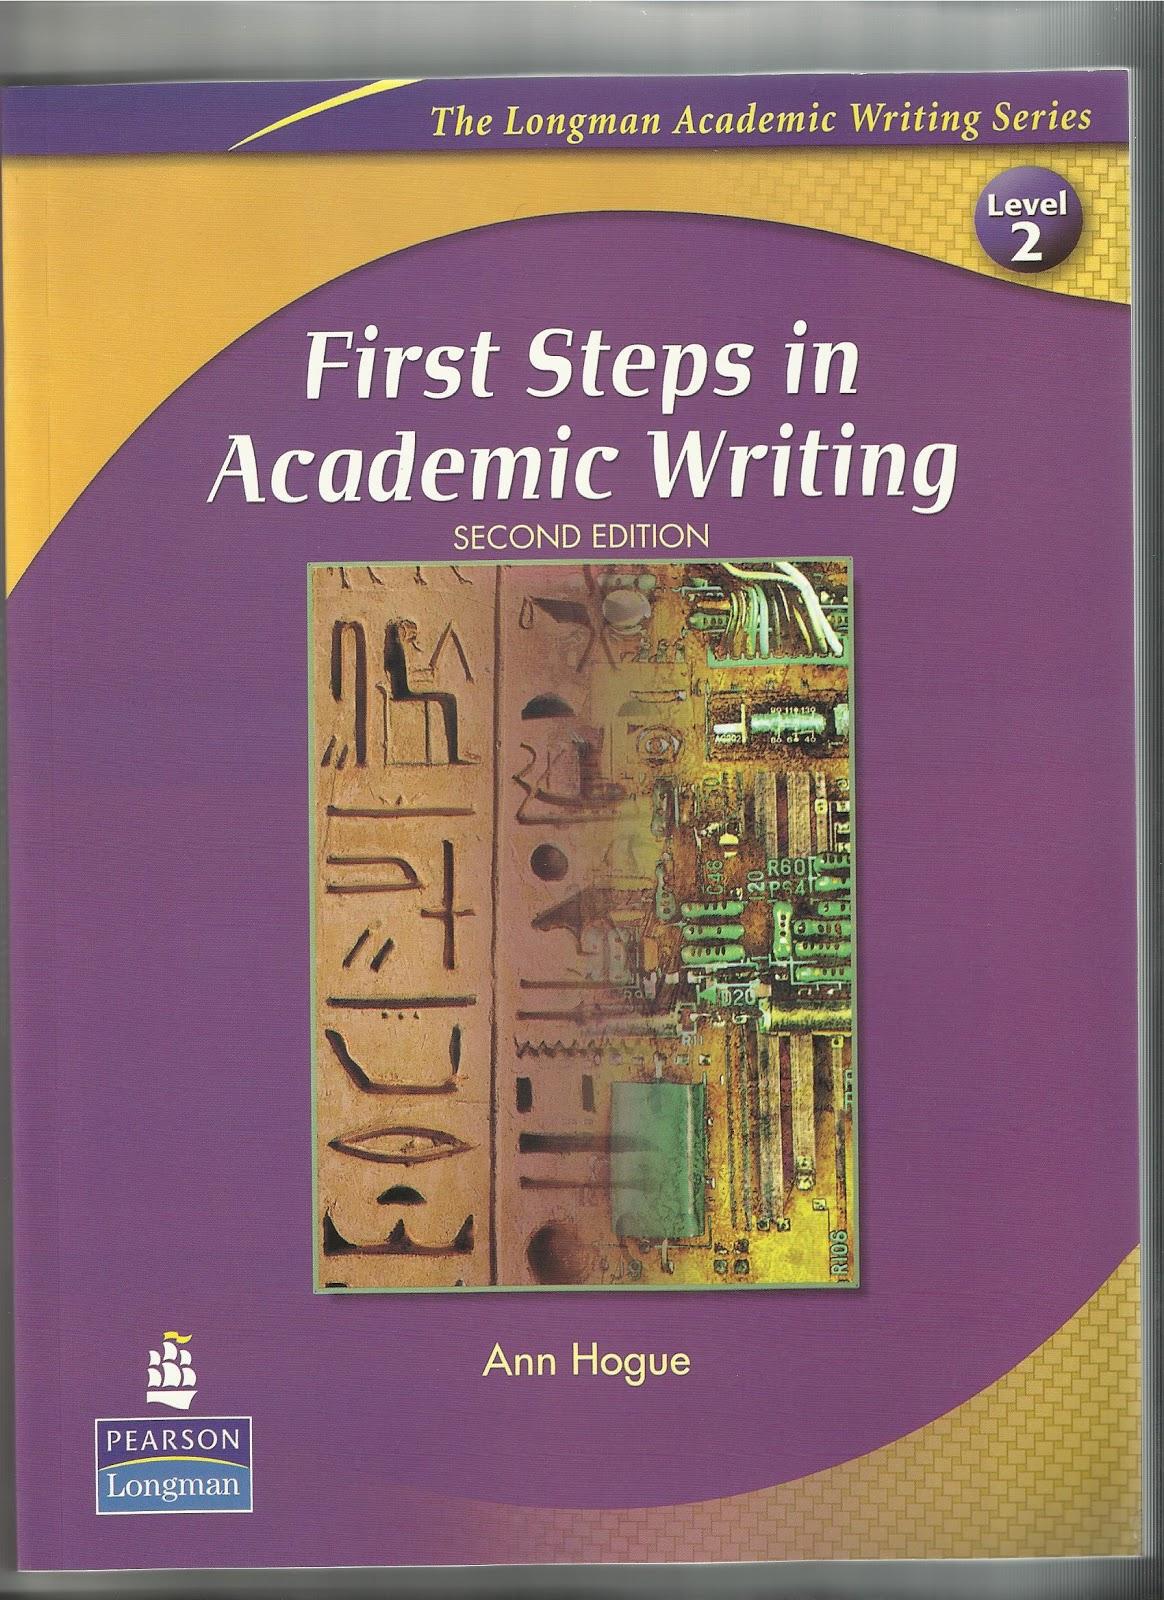 حلول كتاب first steps in academic writing